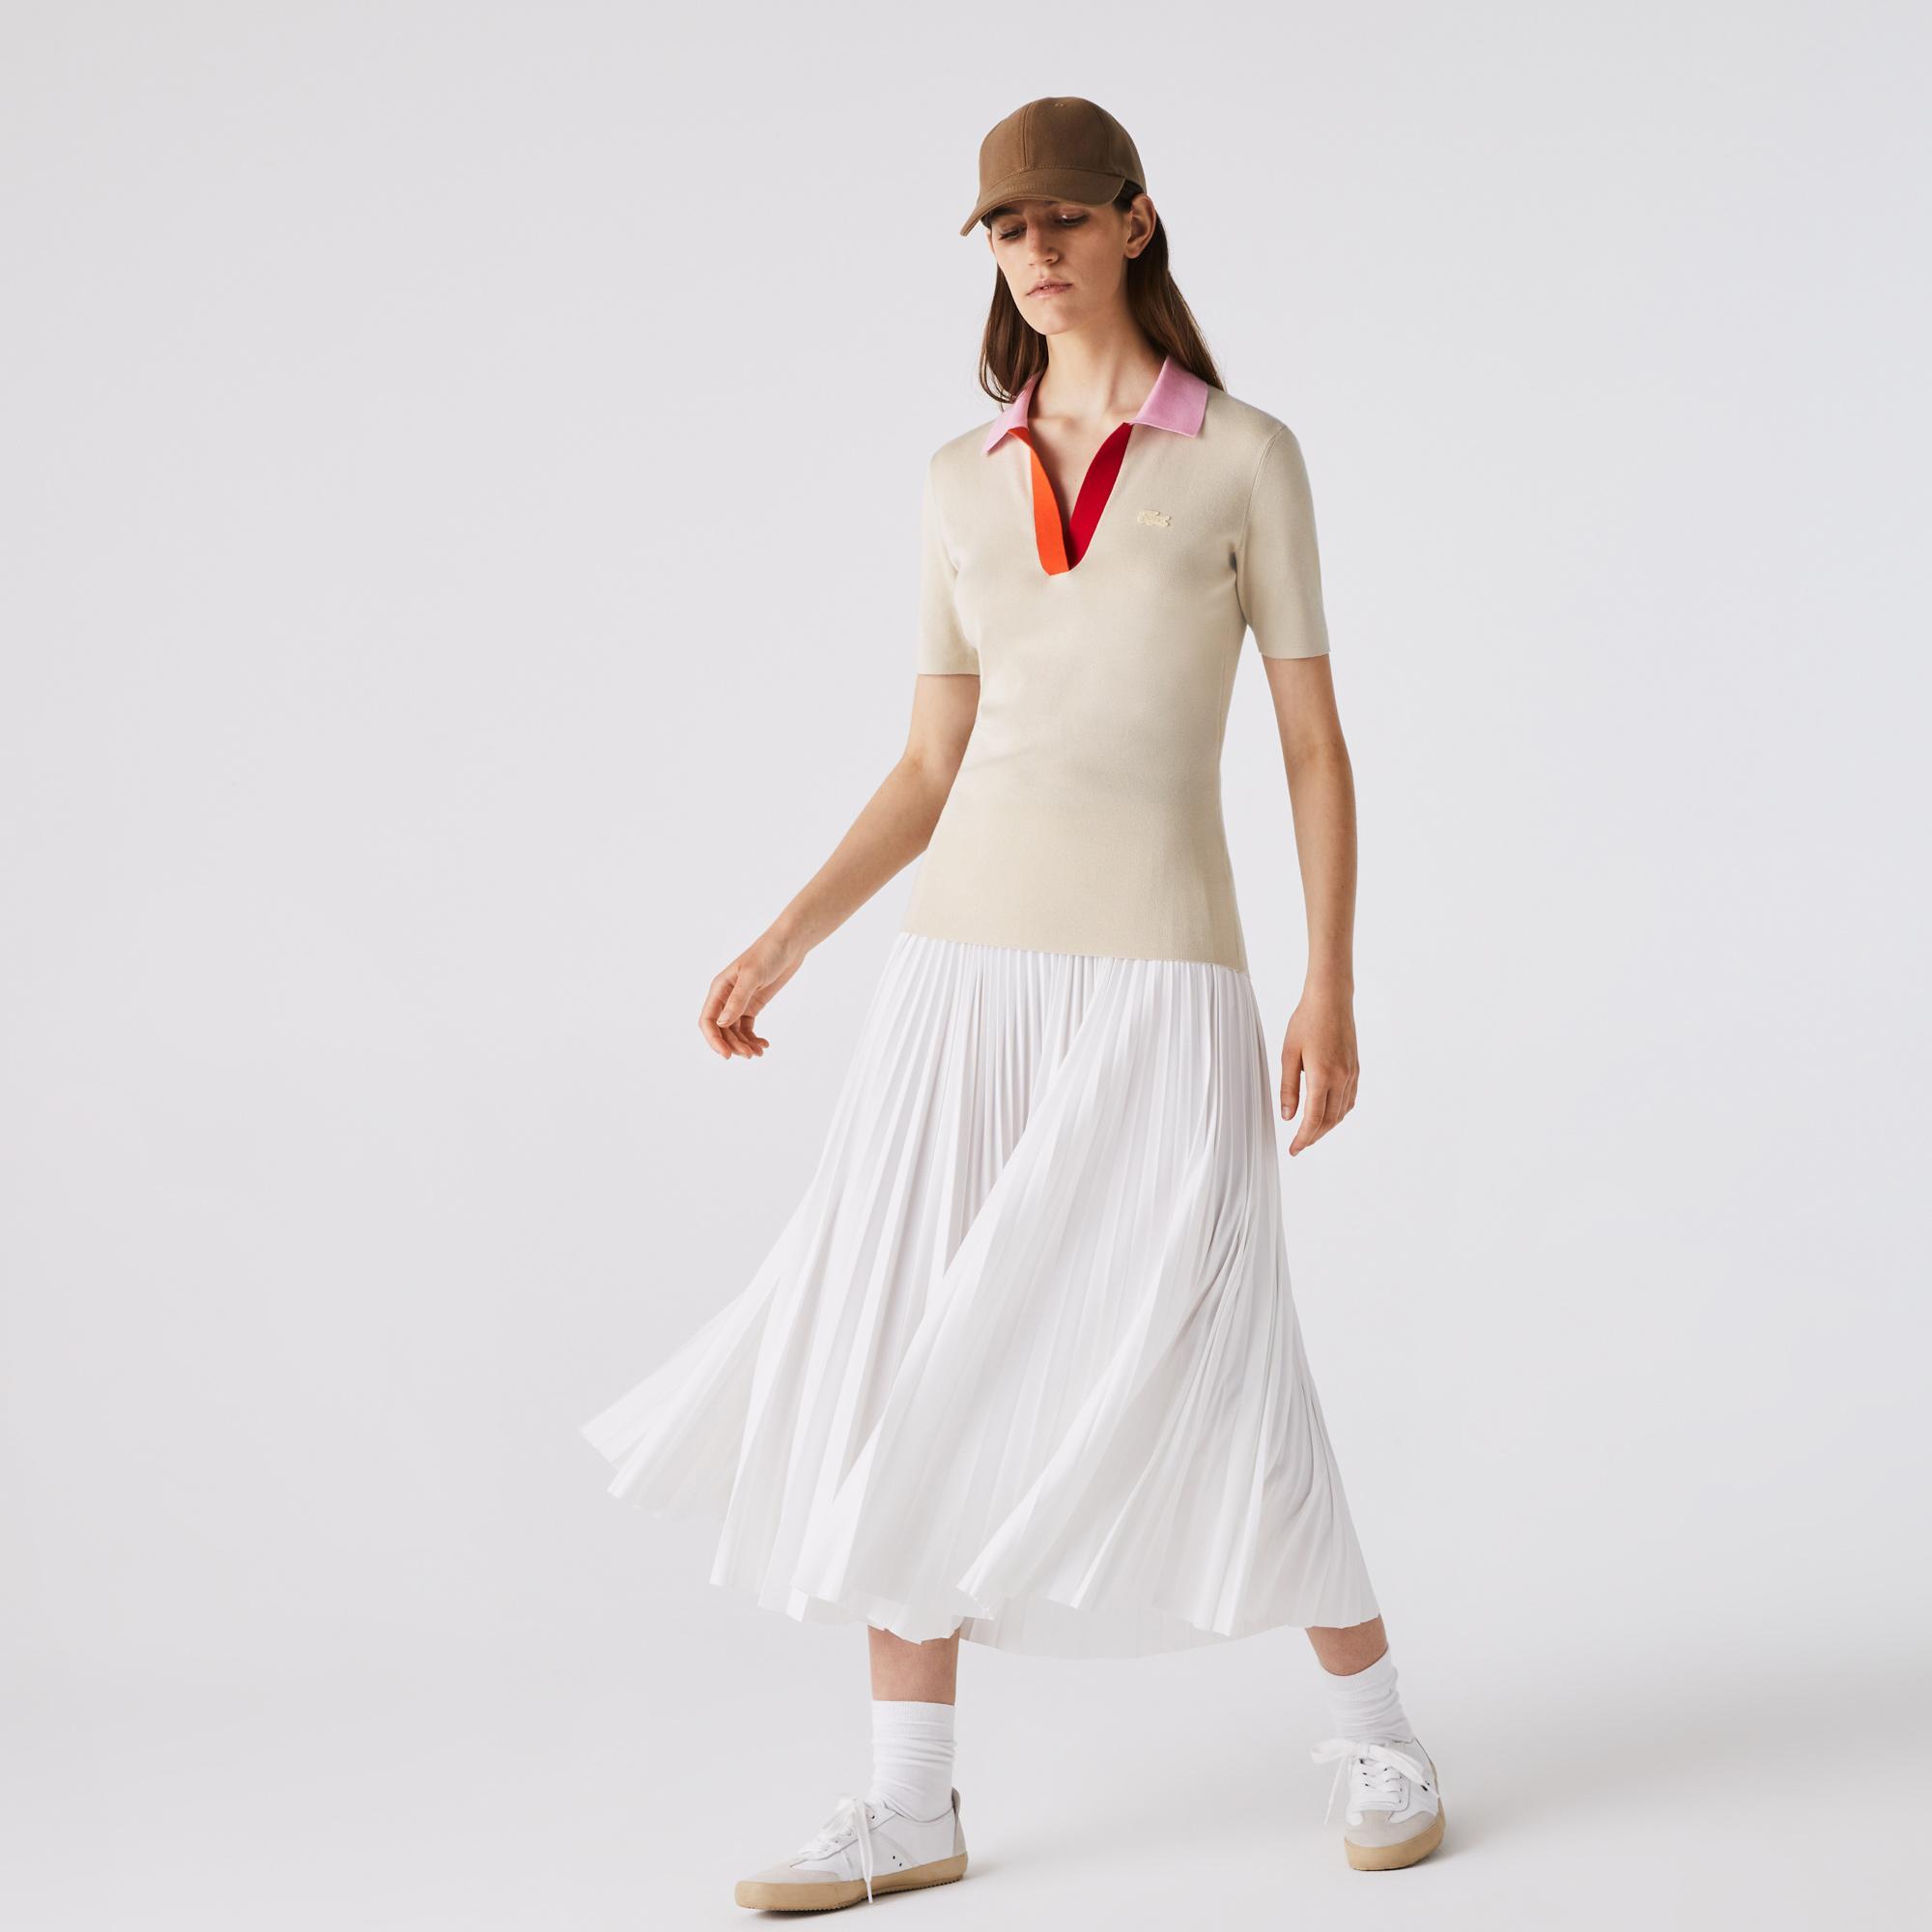 Lacoste Women's Polo Collar Two-Tone Cotton Sweater